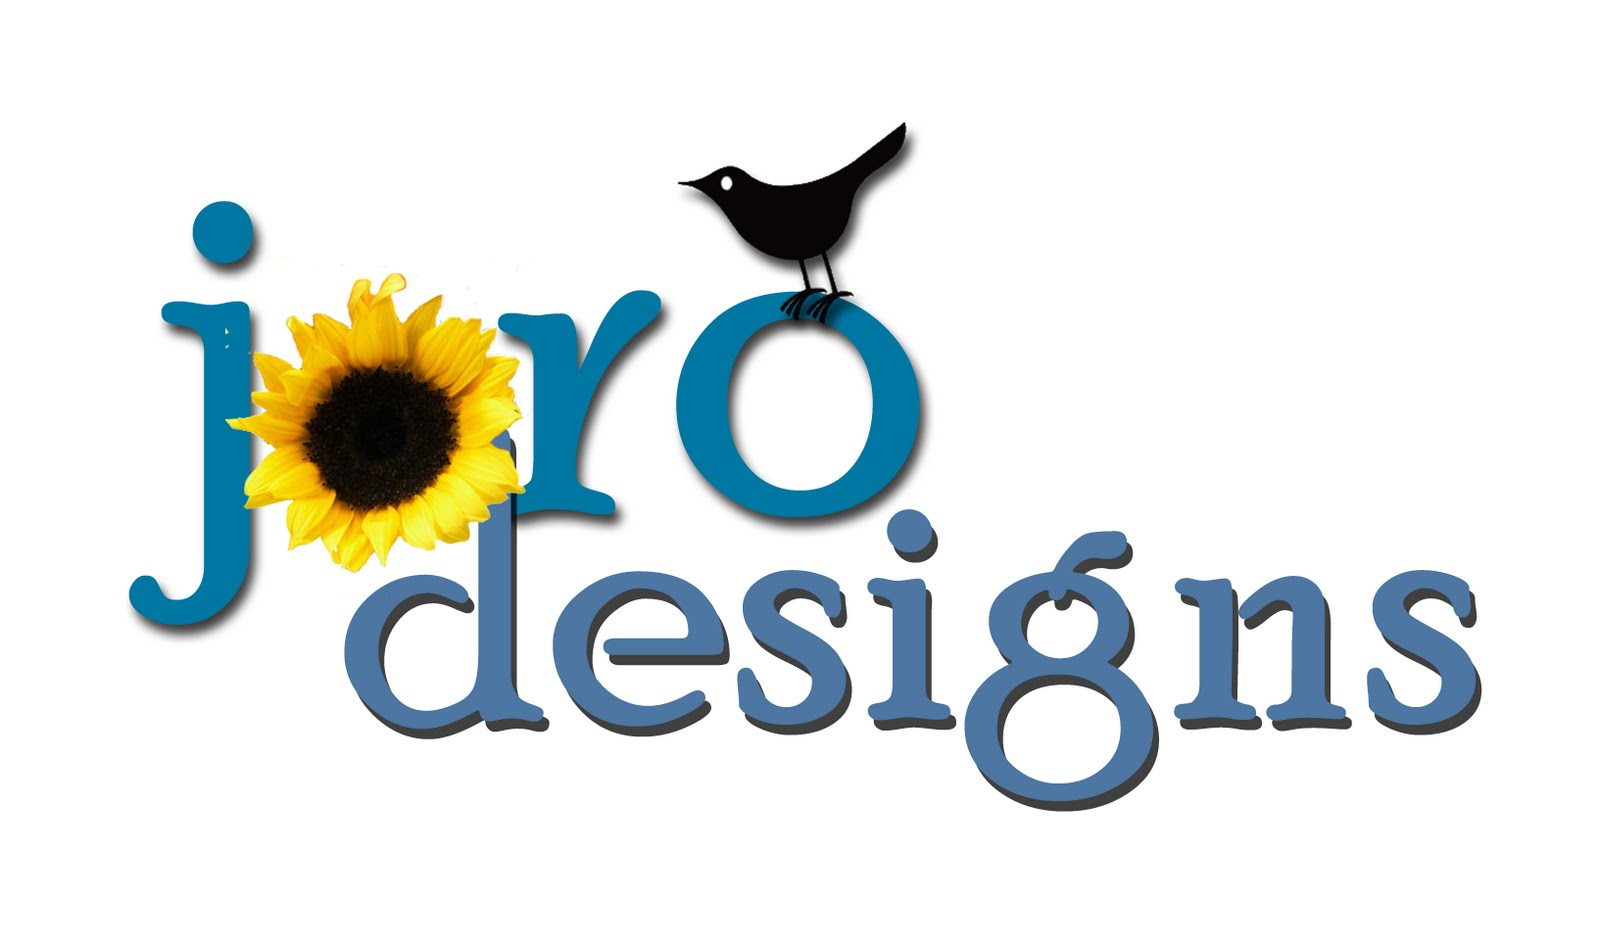 joro designs